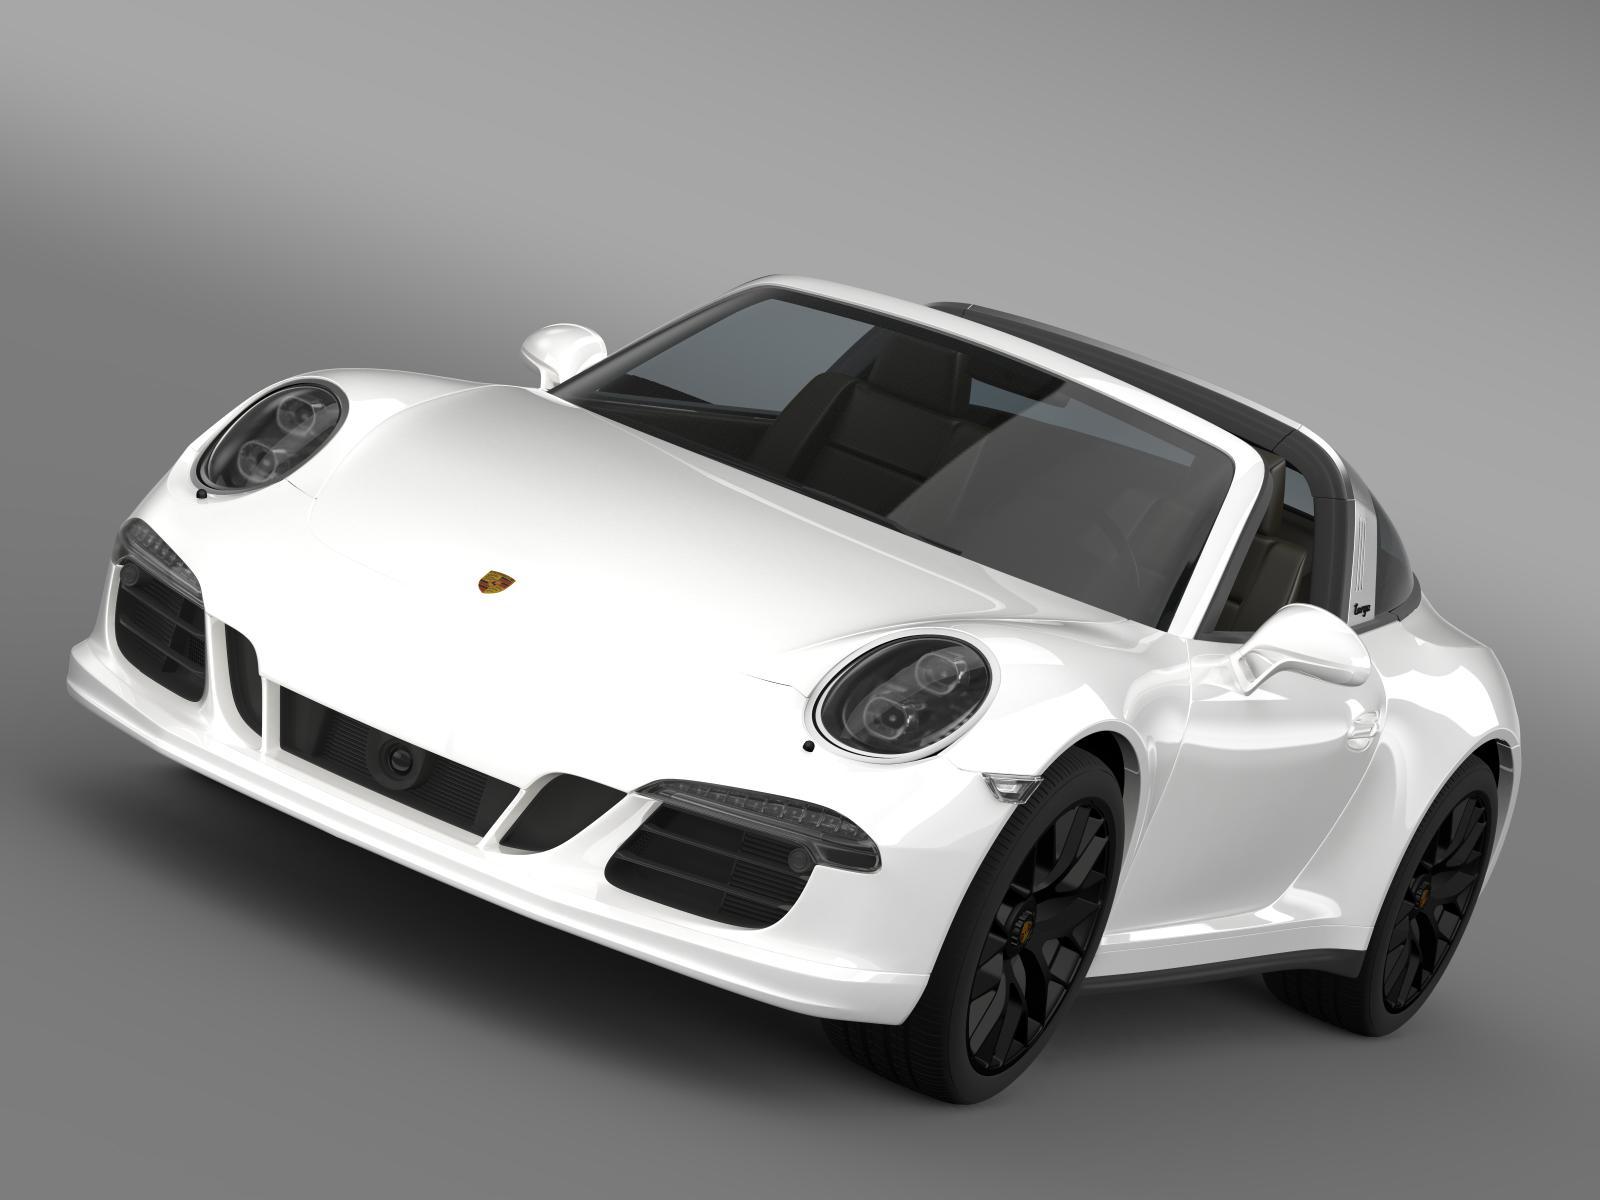 porsche 911 targa 4 gts (991) 2015 3d model 3ds max fbx c4d lwo ma mb hrc xsi obj 204786